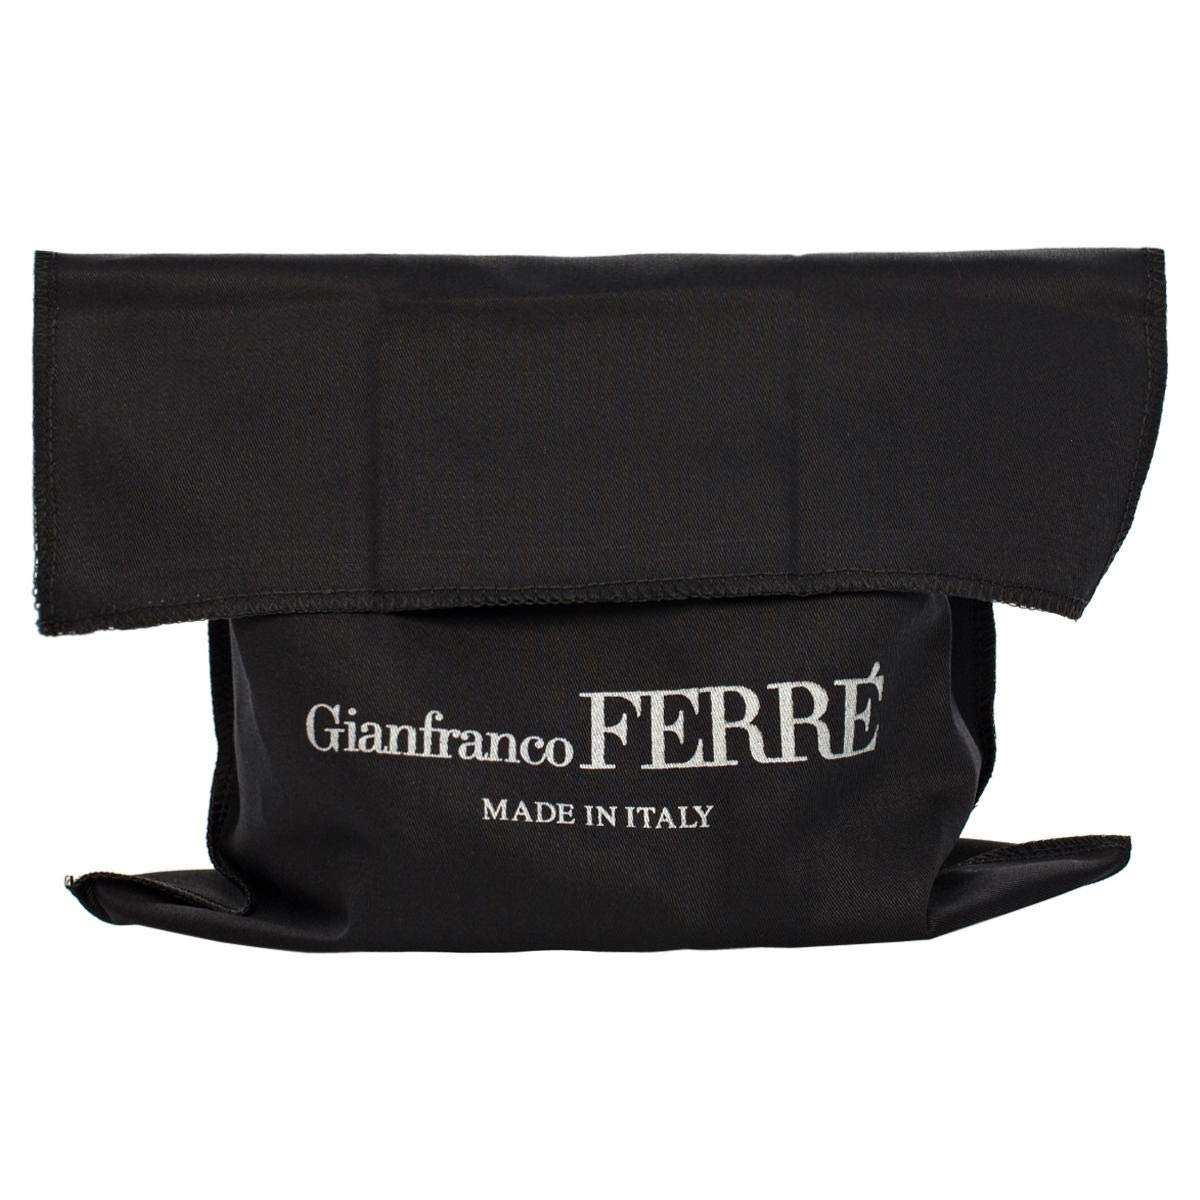 1af7847e7 Gianfranco Ferre F-00054619 Crossbody Bag for Women - Leather, Black:  Amazon.ae: GianfrancoFERRE